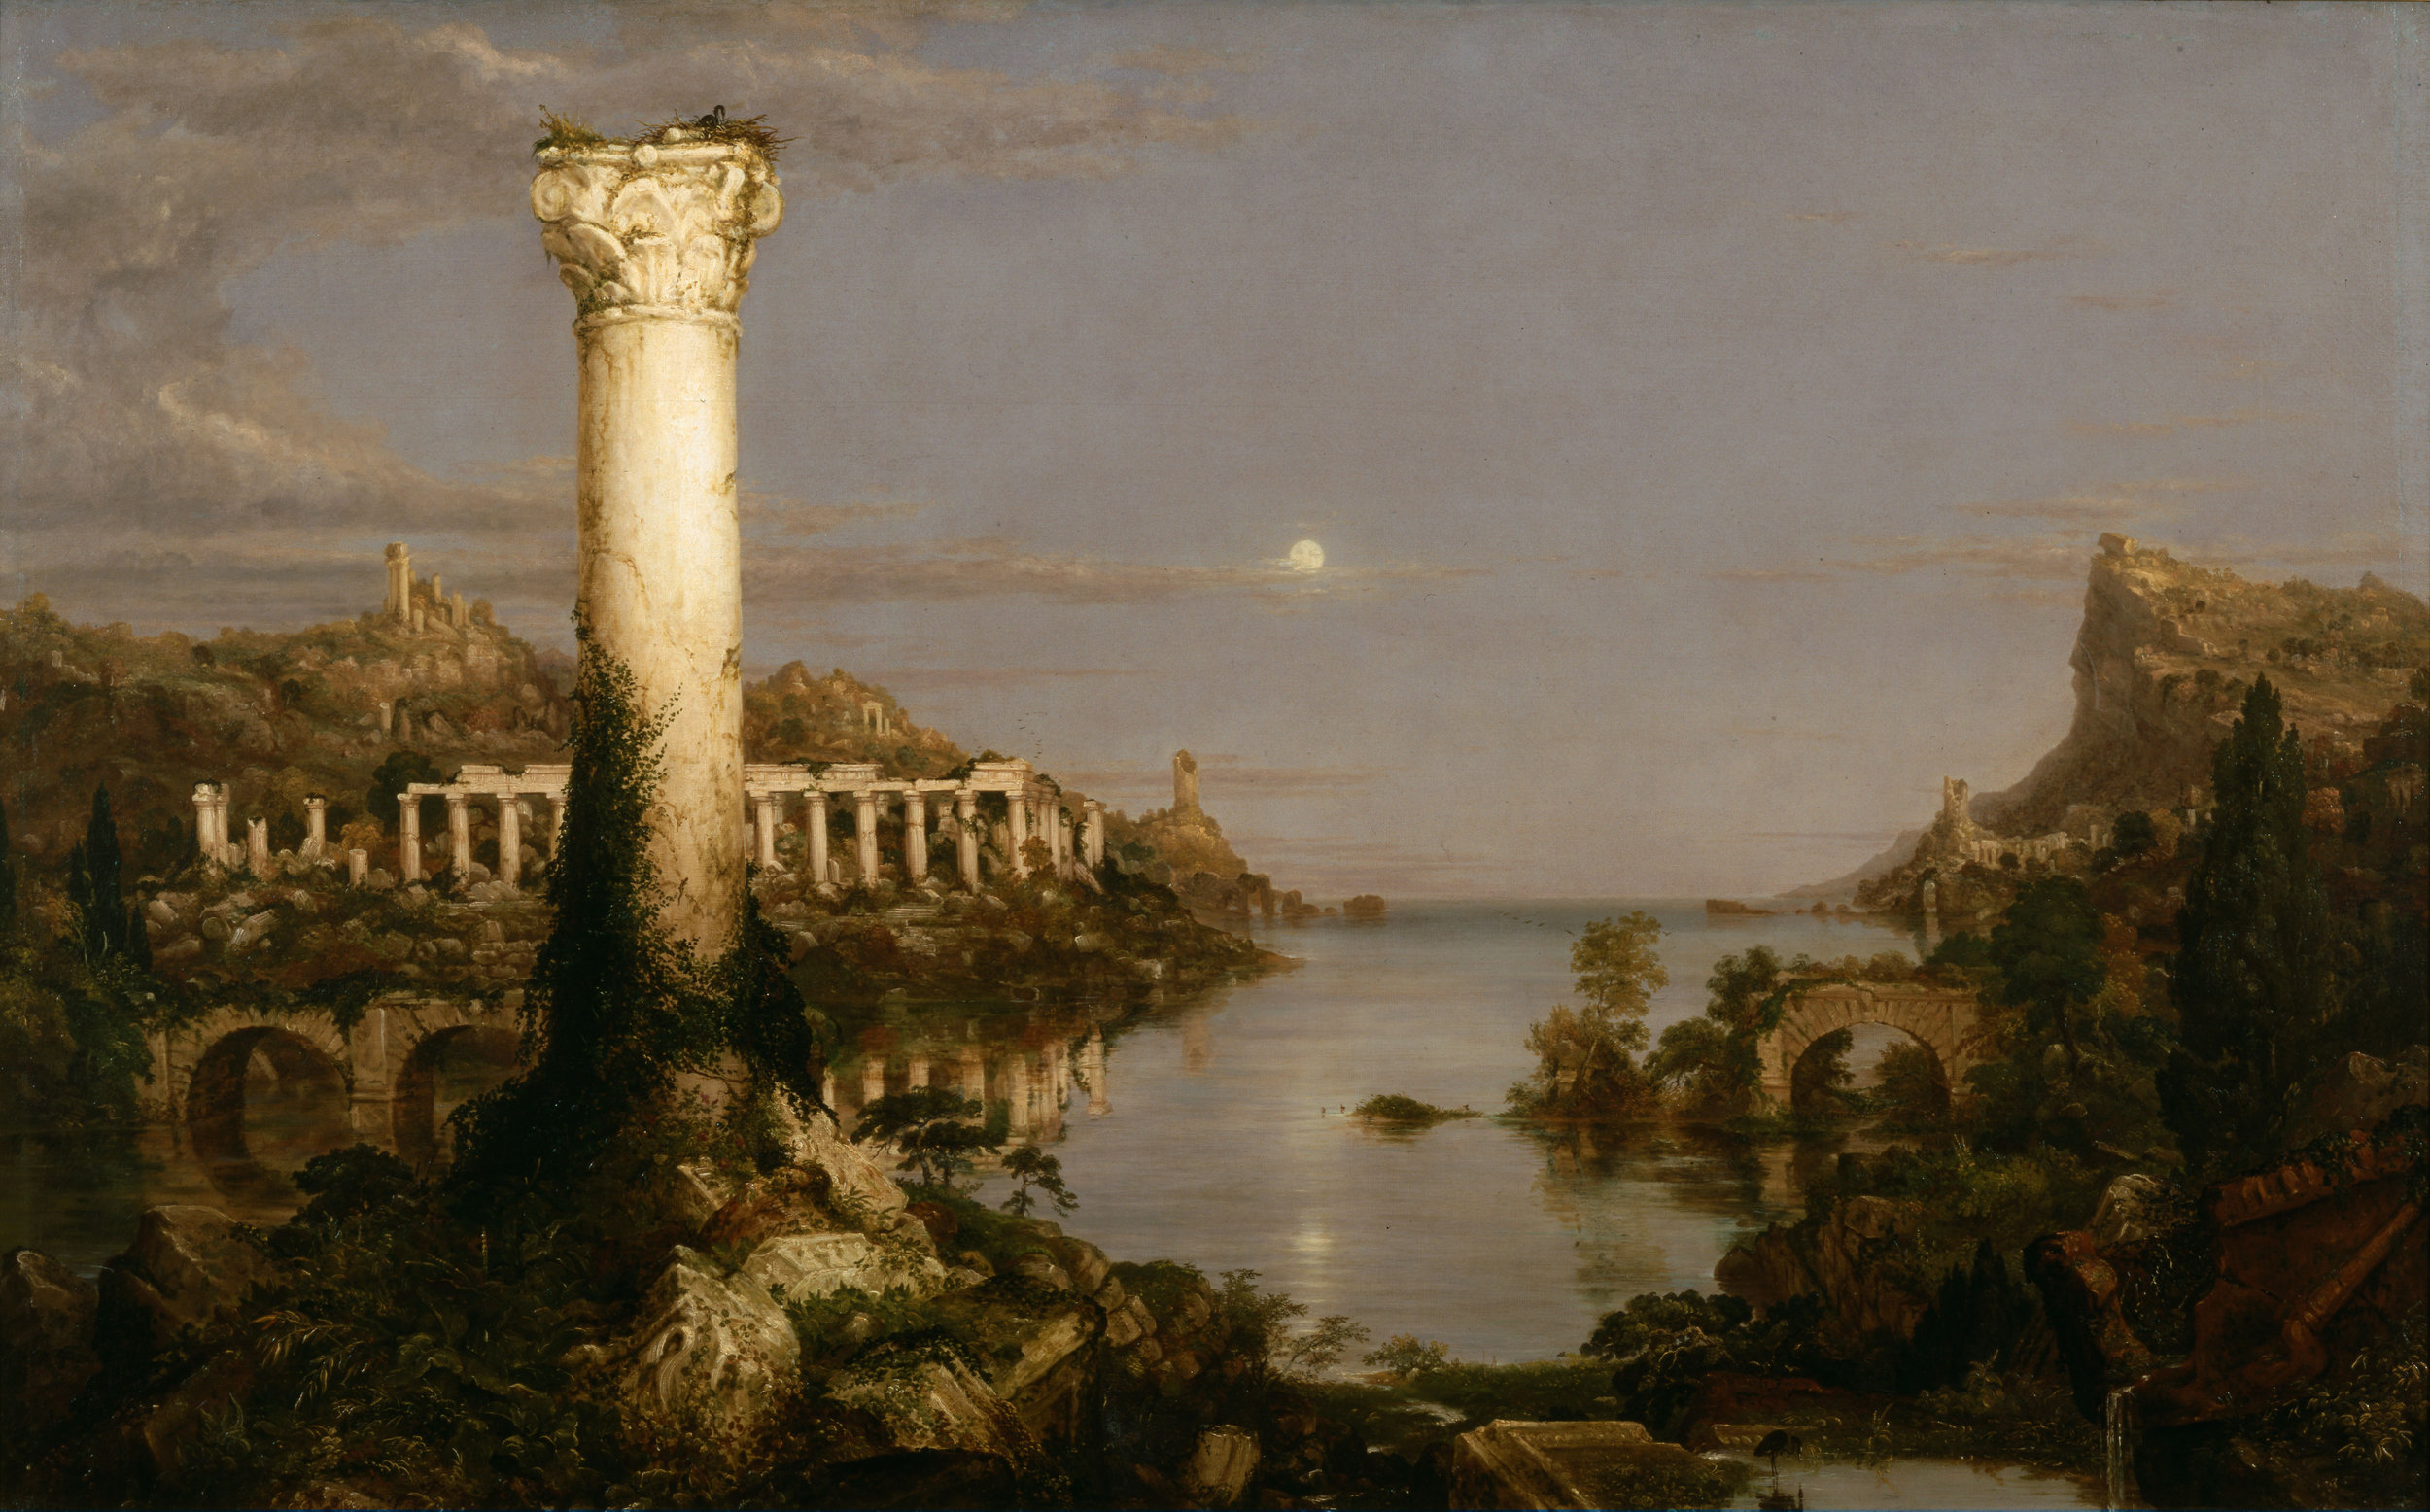 Cole_Thomas_The_Course_of_Empire_Desolation_1836.jpg